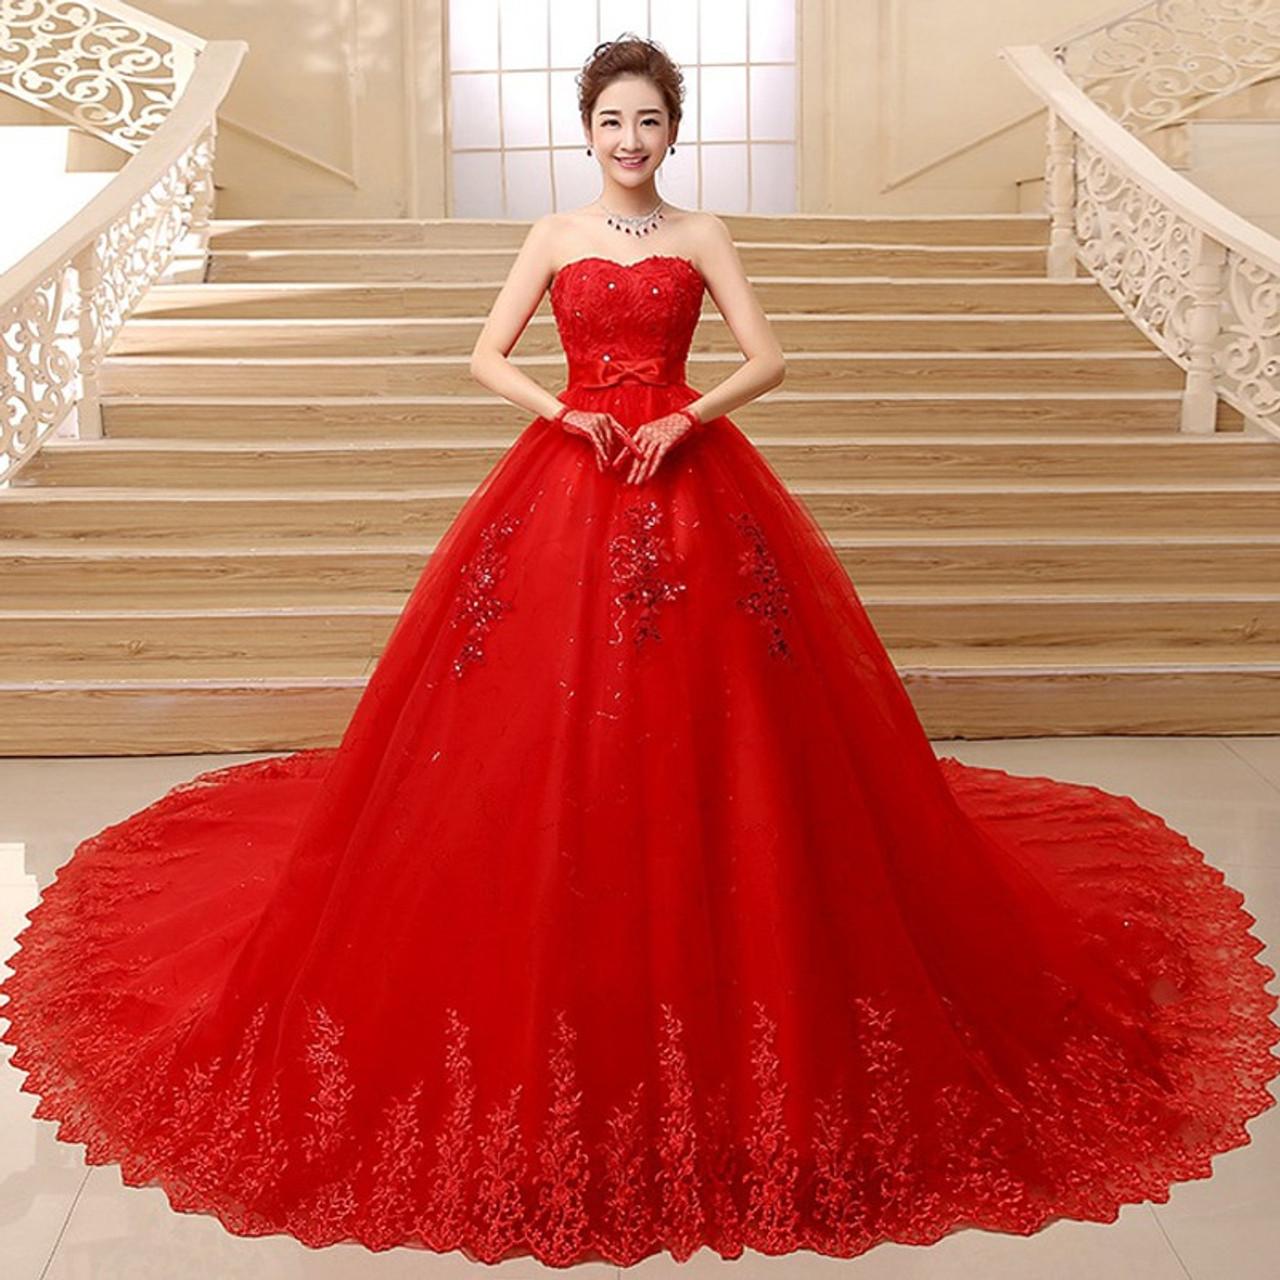 961983212c0 beautiful Vintage Lace Red Ball Gown Wedding Dresses 2018 New Detachable  Long train Lace Appliques Bridal ...